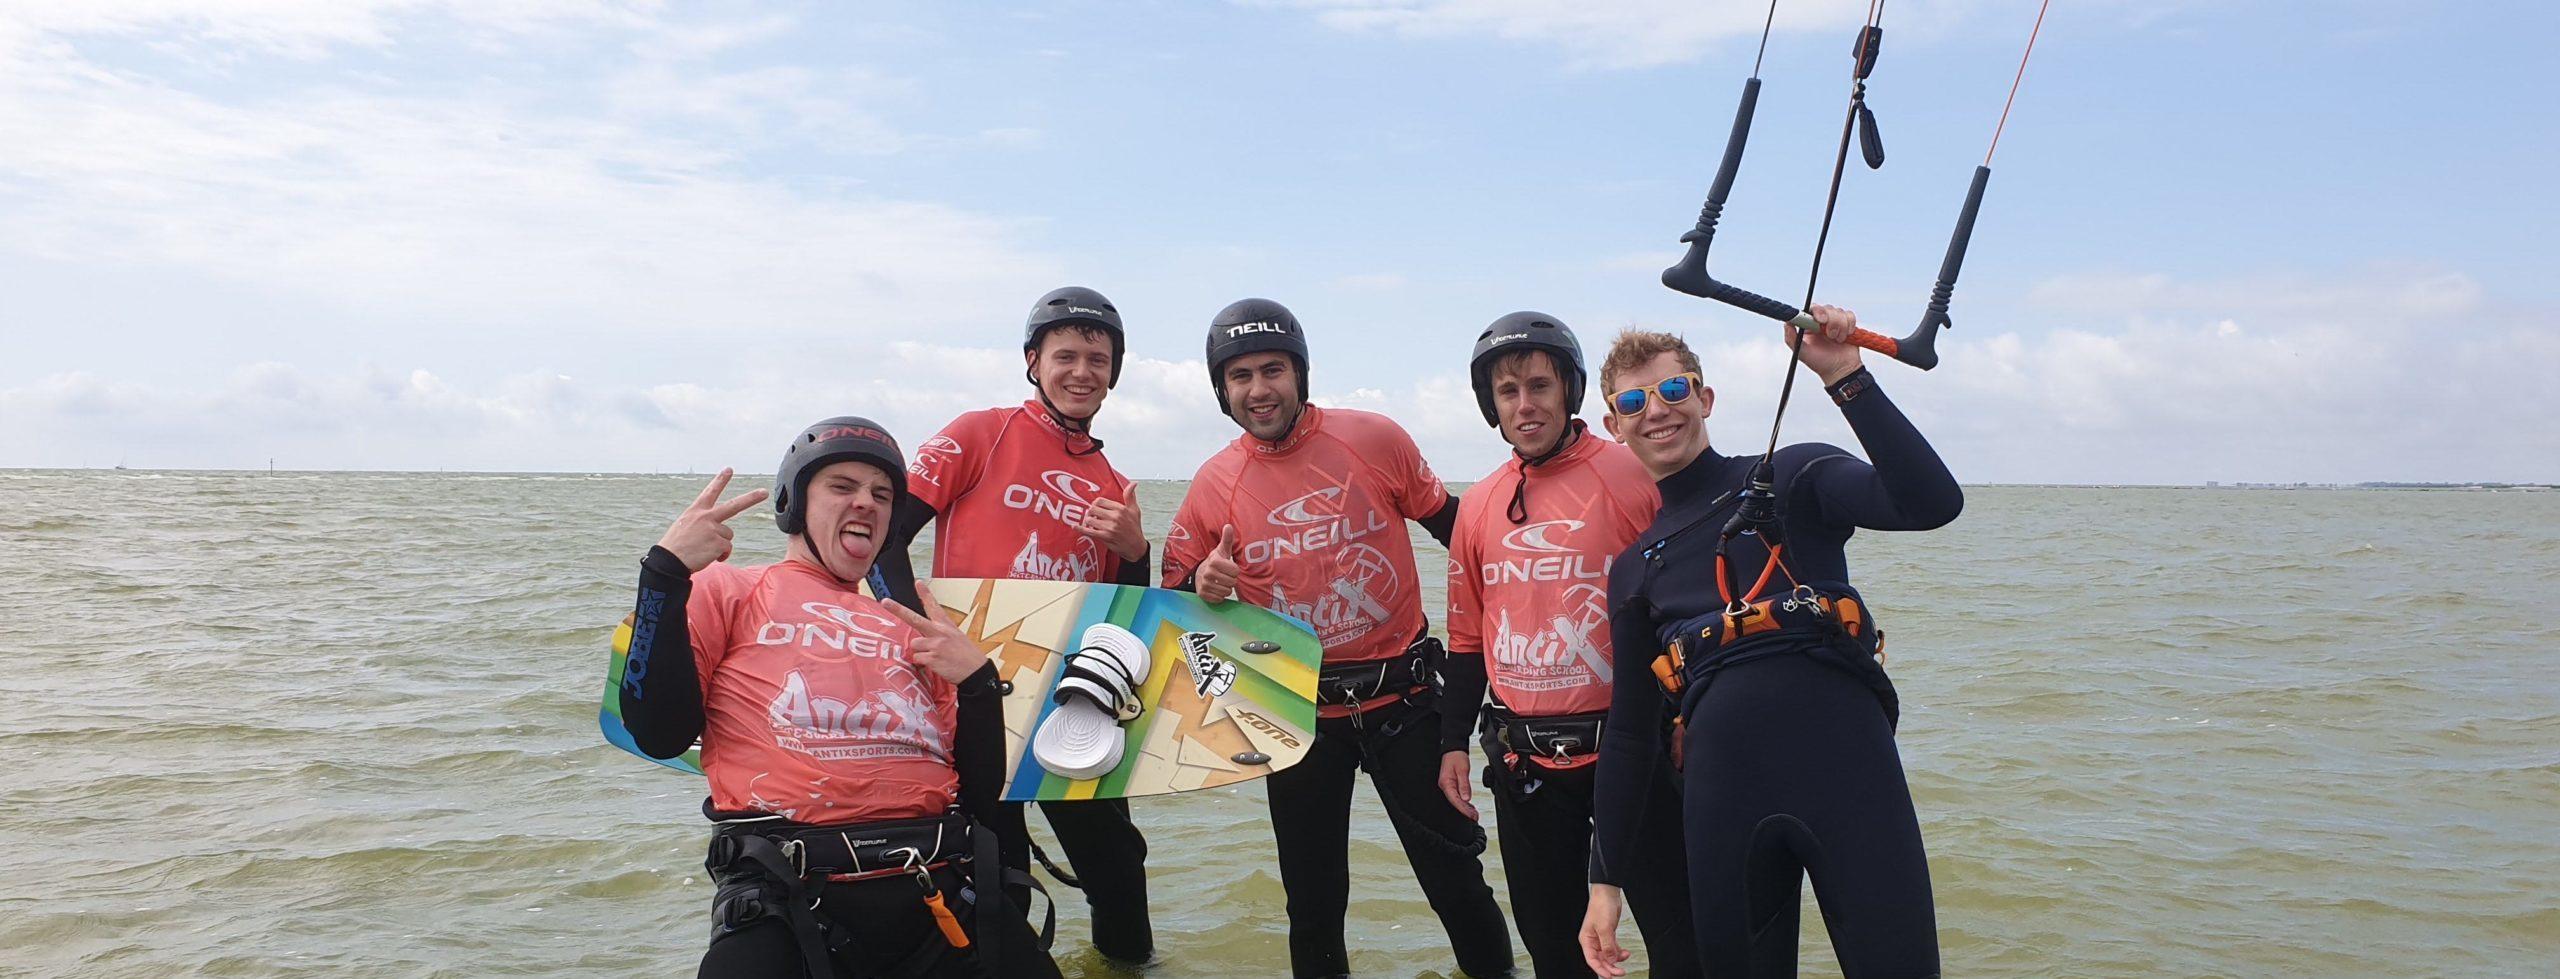 kitesurf instructeur worden